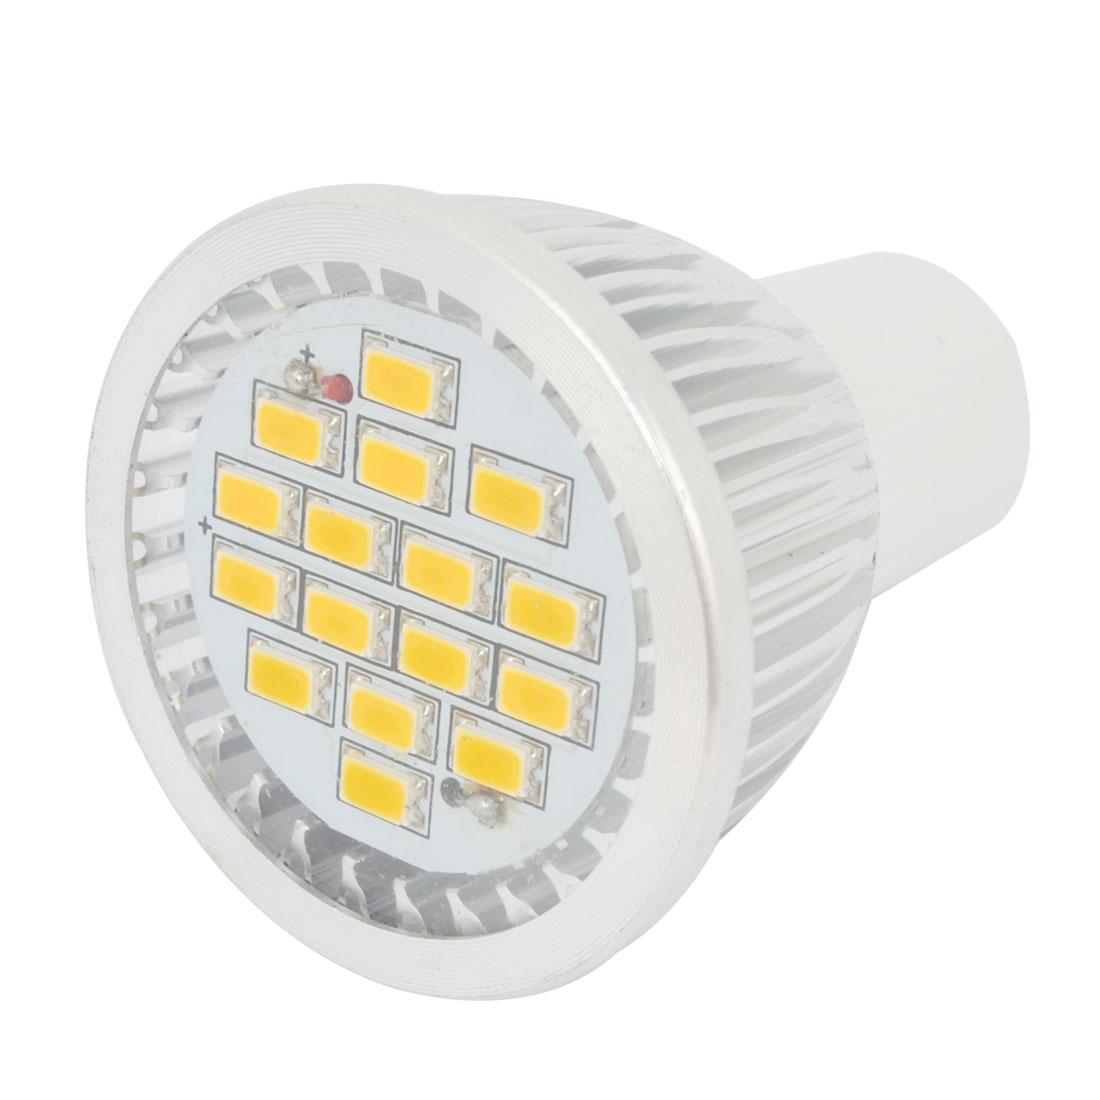 AC 220V Yellow 16 3528 SMD LED Spot Light Energy Saving Bulb GU5.3 3000K 3W